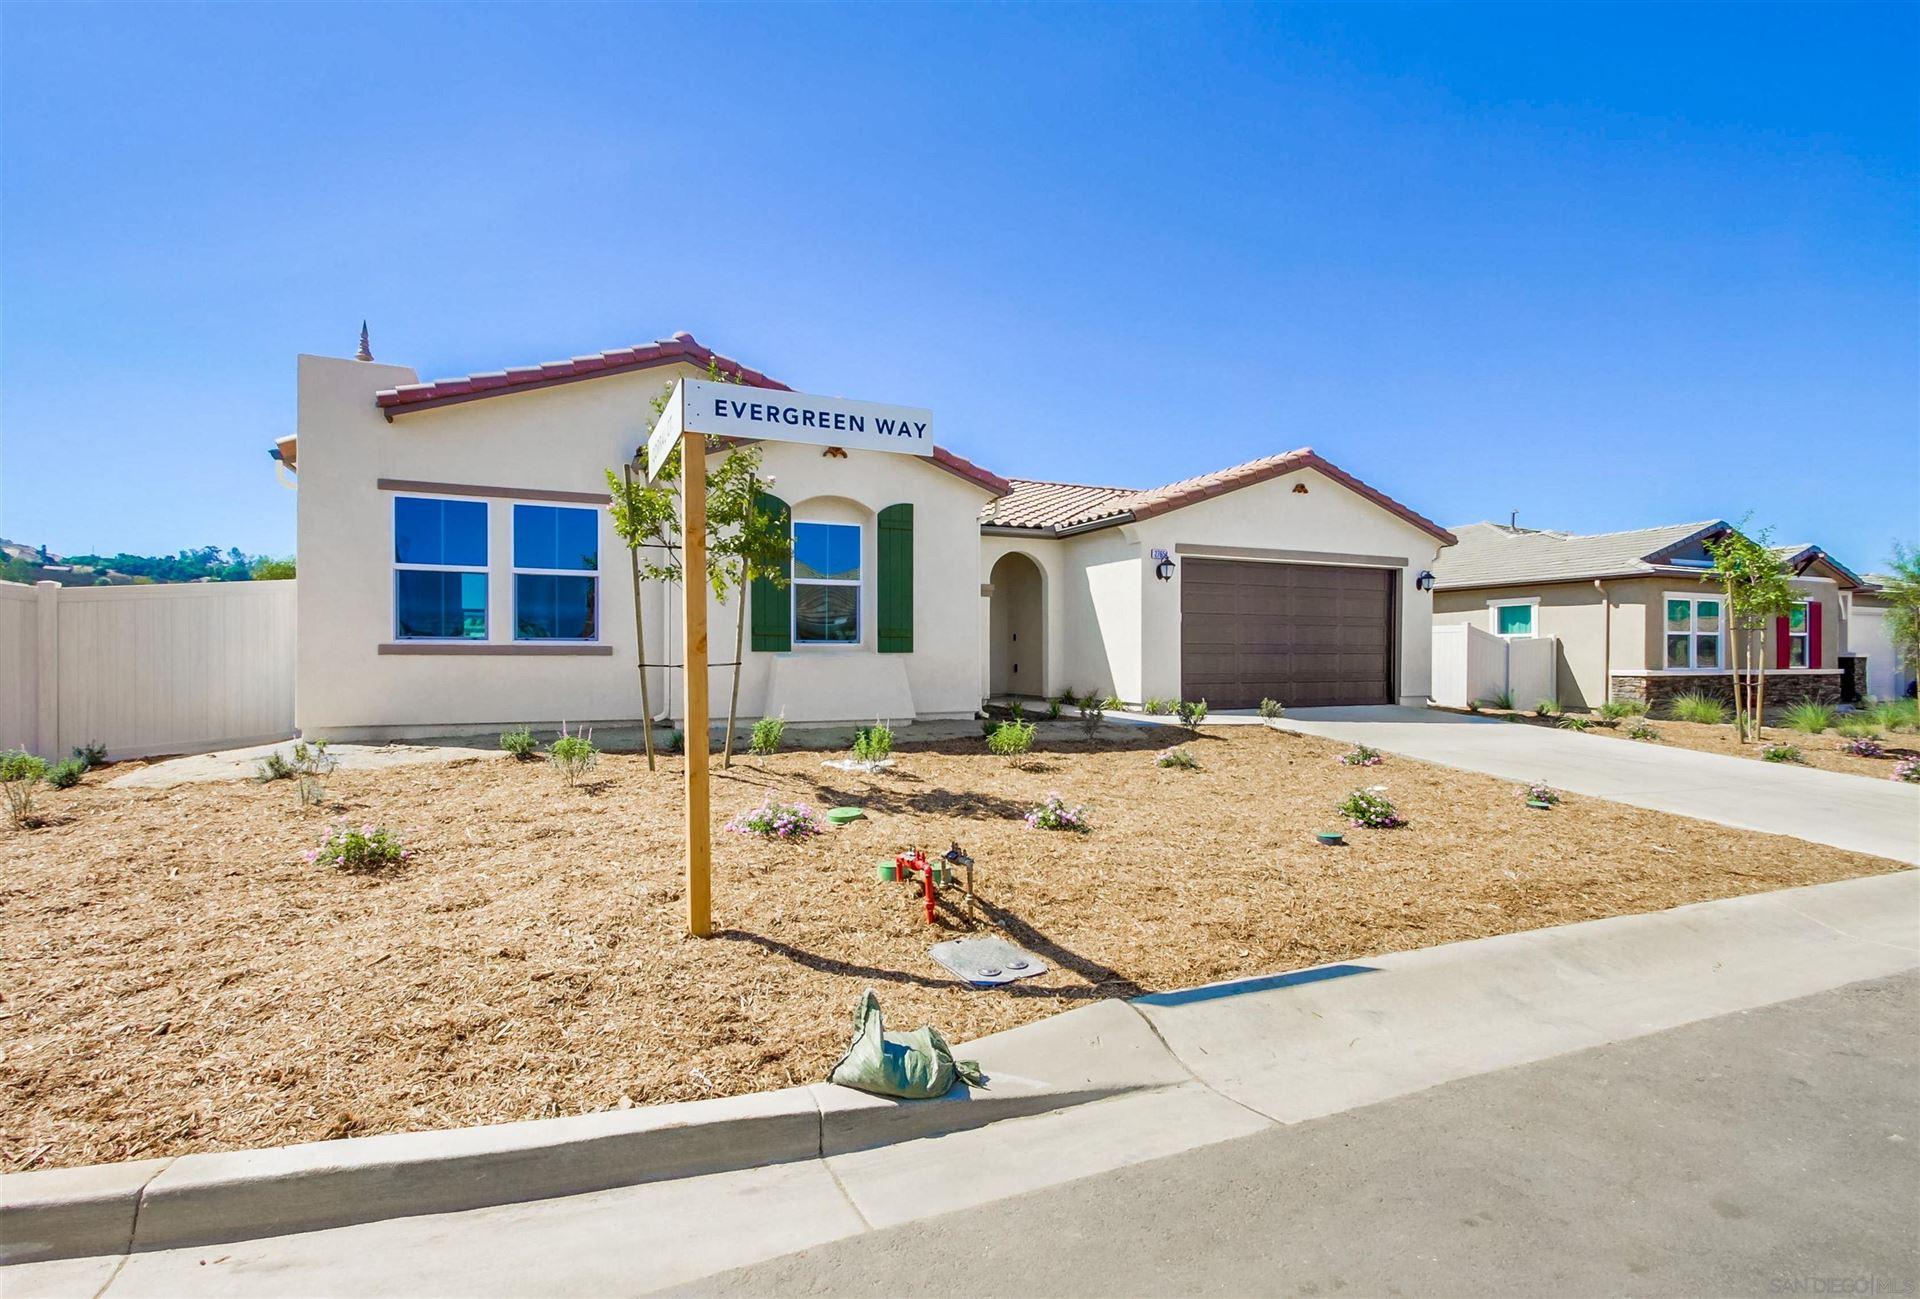 Photo of 27654 Evergreen Way, Valley Center, CA 92082 (MLS # 210026359)